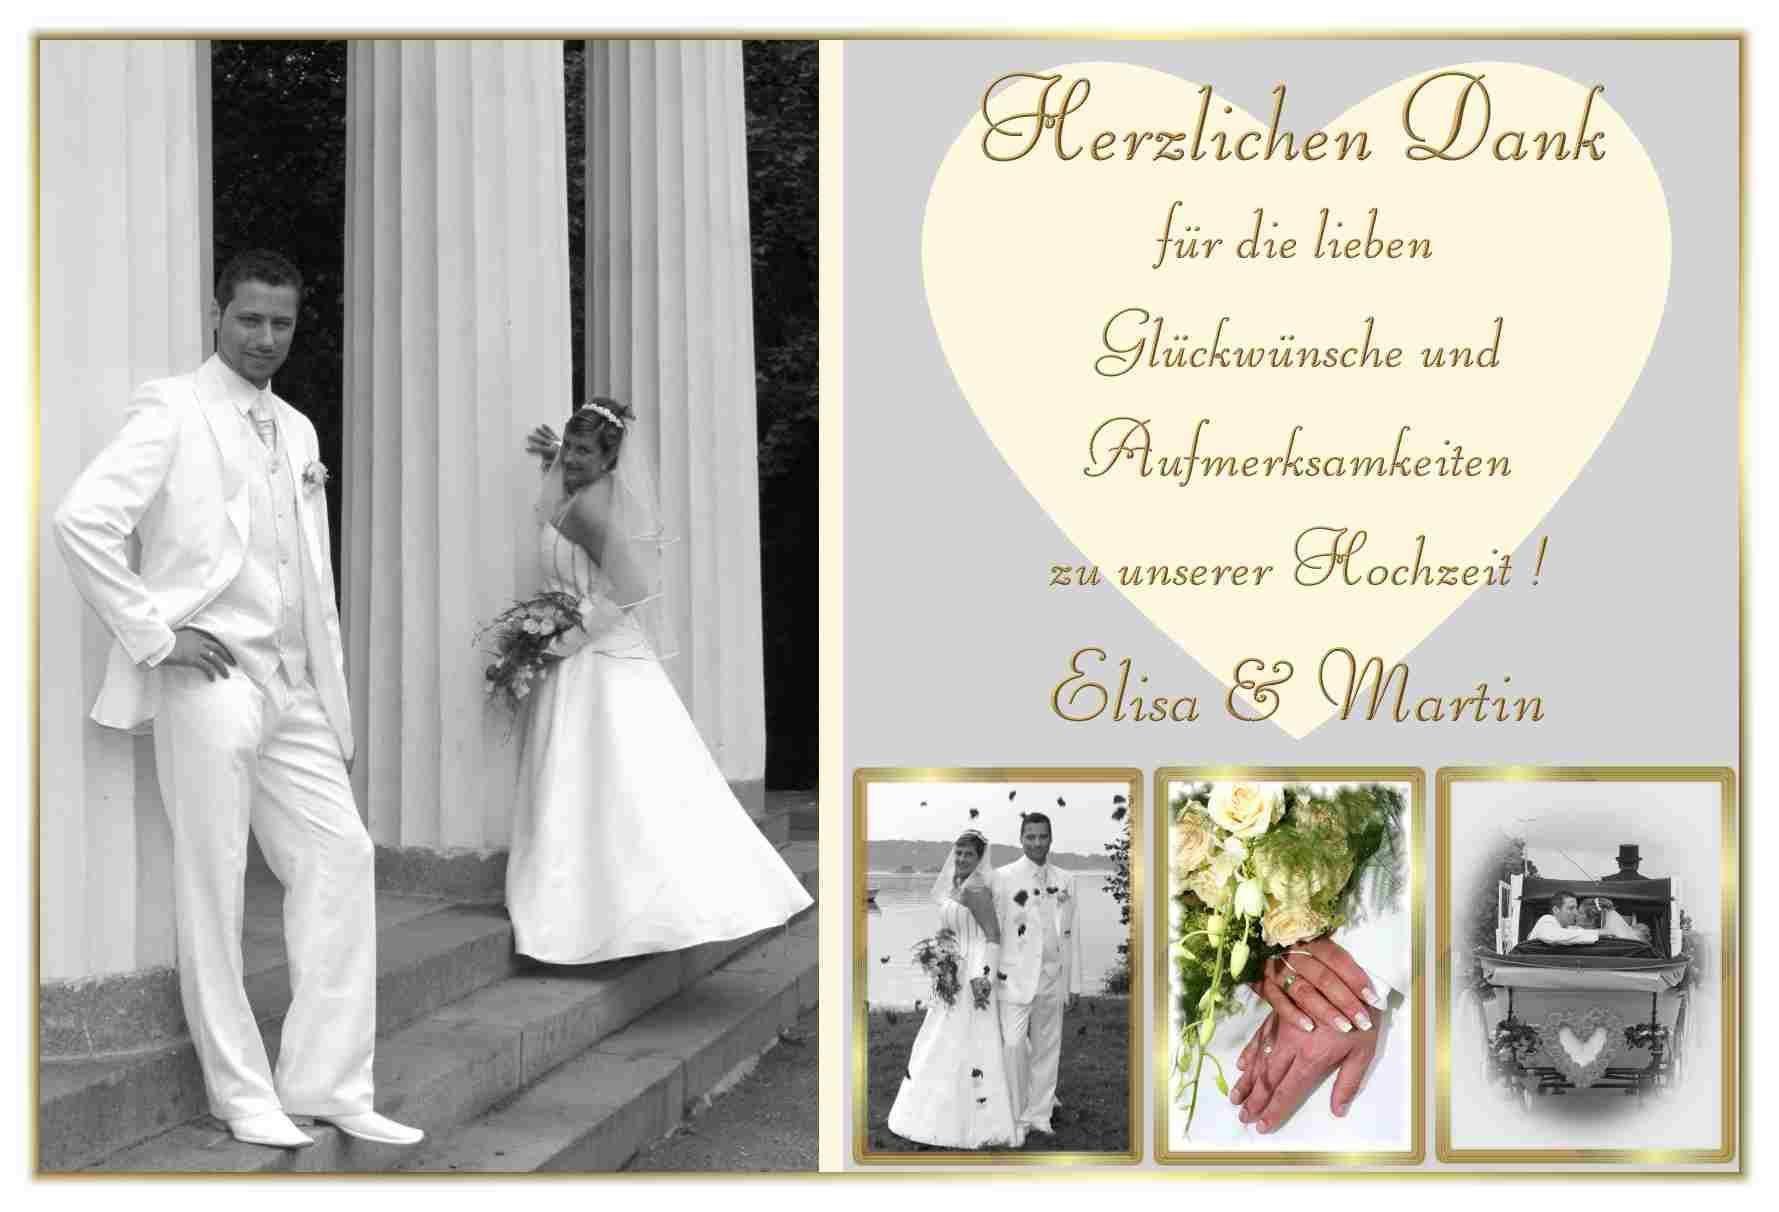 Dankeskarte Hochzeit Text  Dankeskarte Hochzeit Text Dankeskarten Hochzeit Text